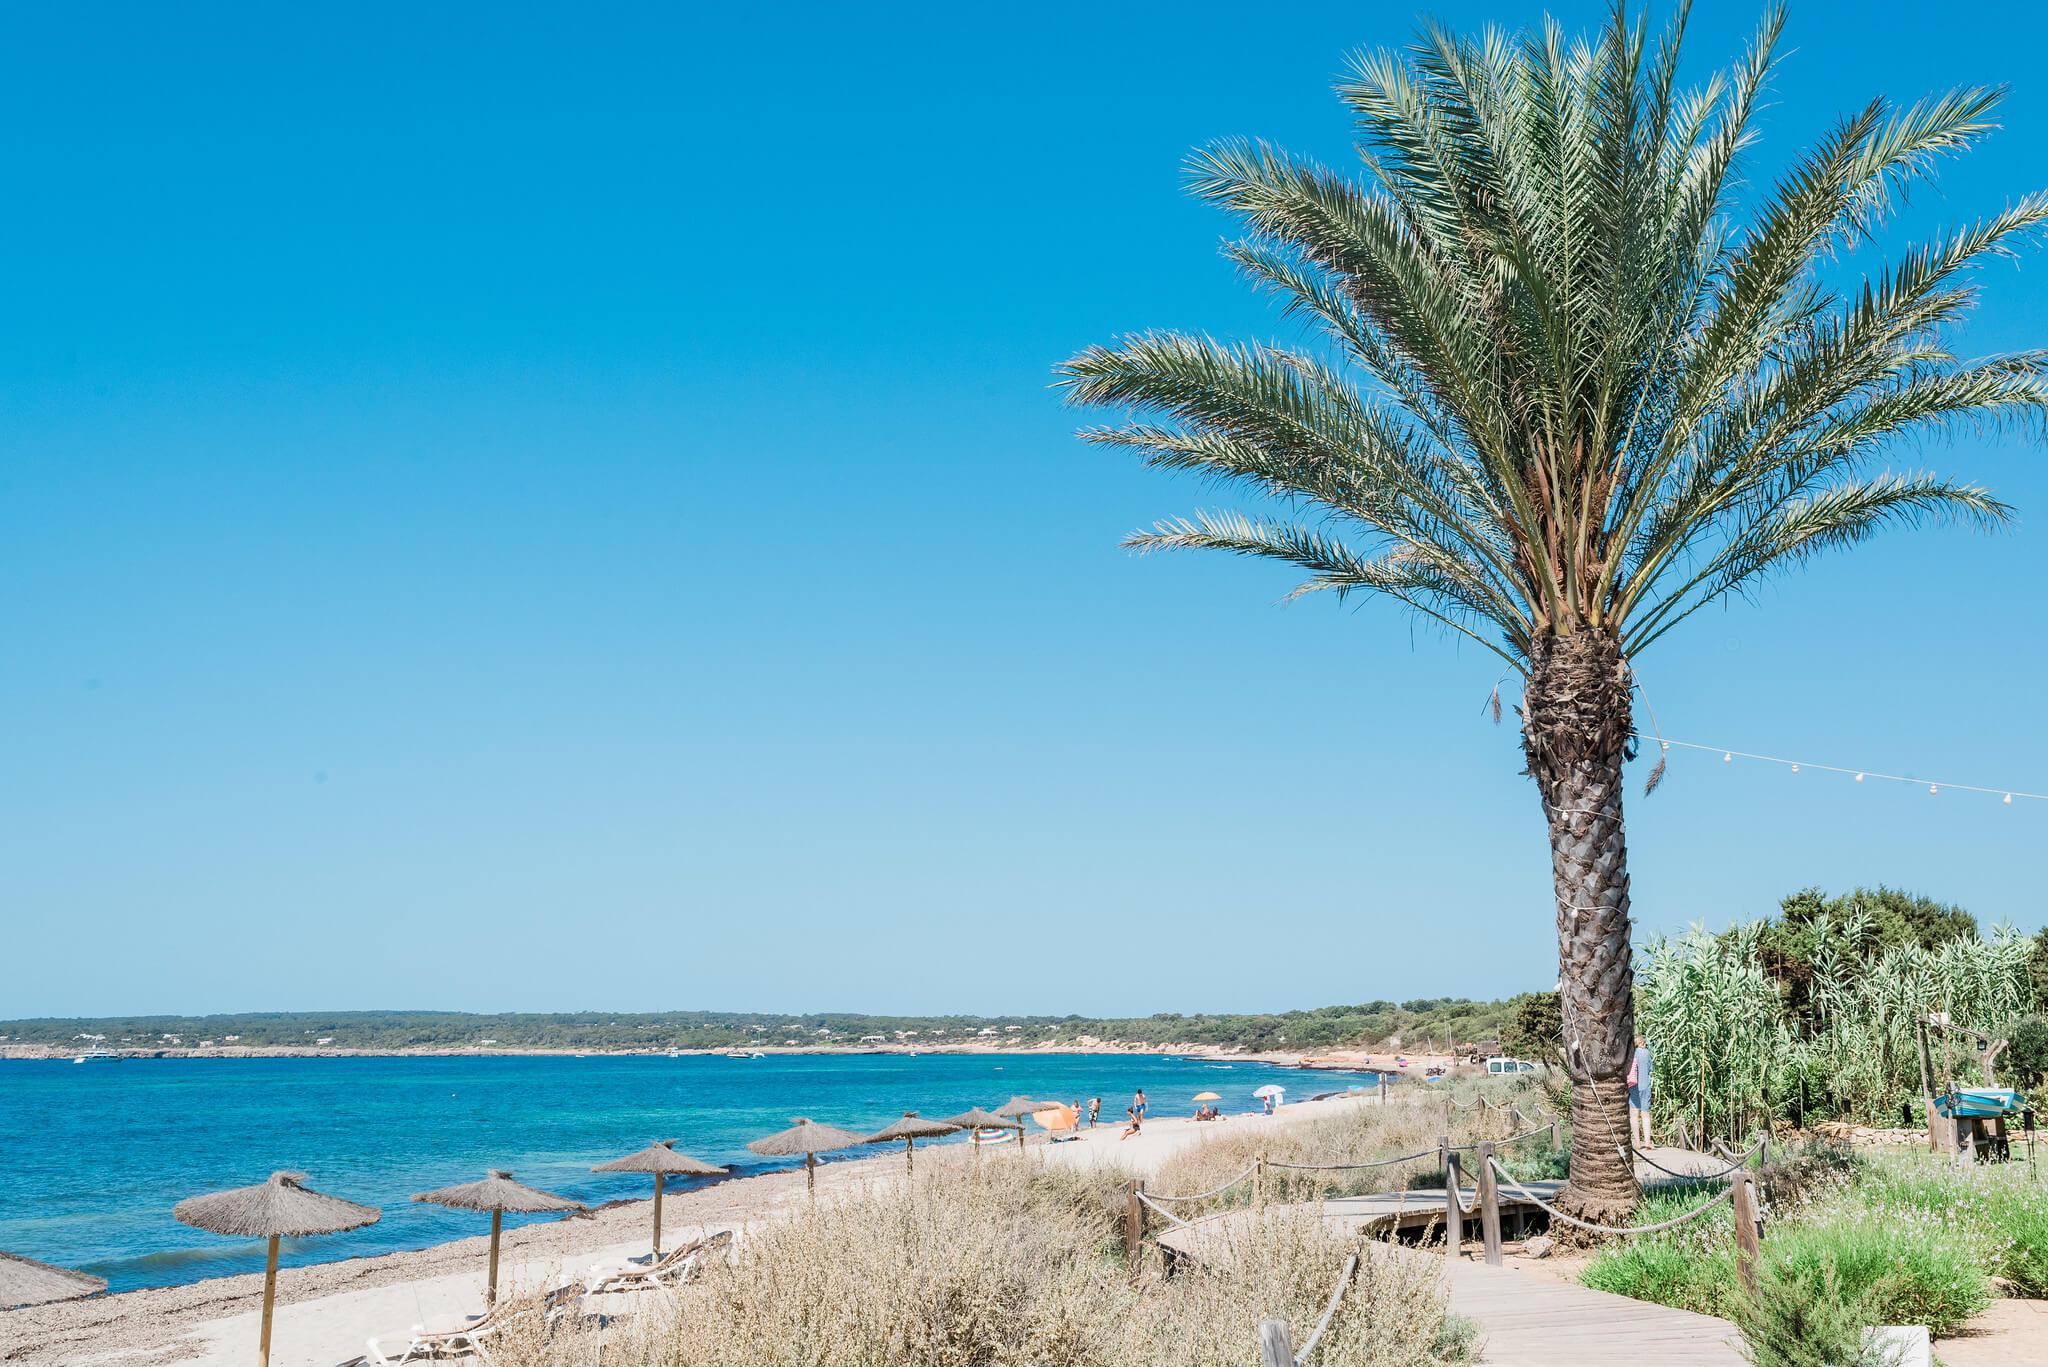 https://www.white-ibiza.com/wp-content/uploads/2020/03/formentera-beaches-migjorn-2020-04.jpg